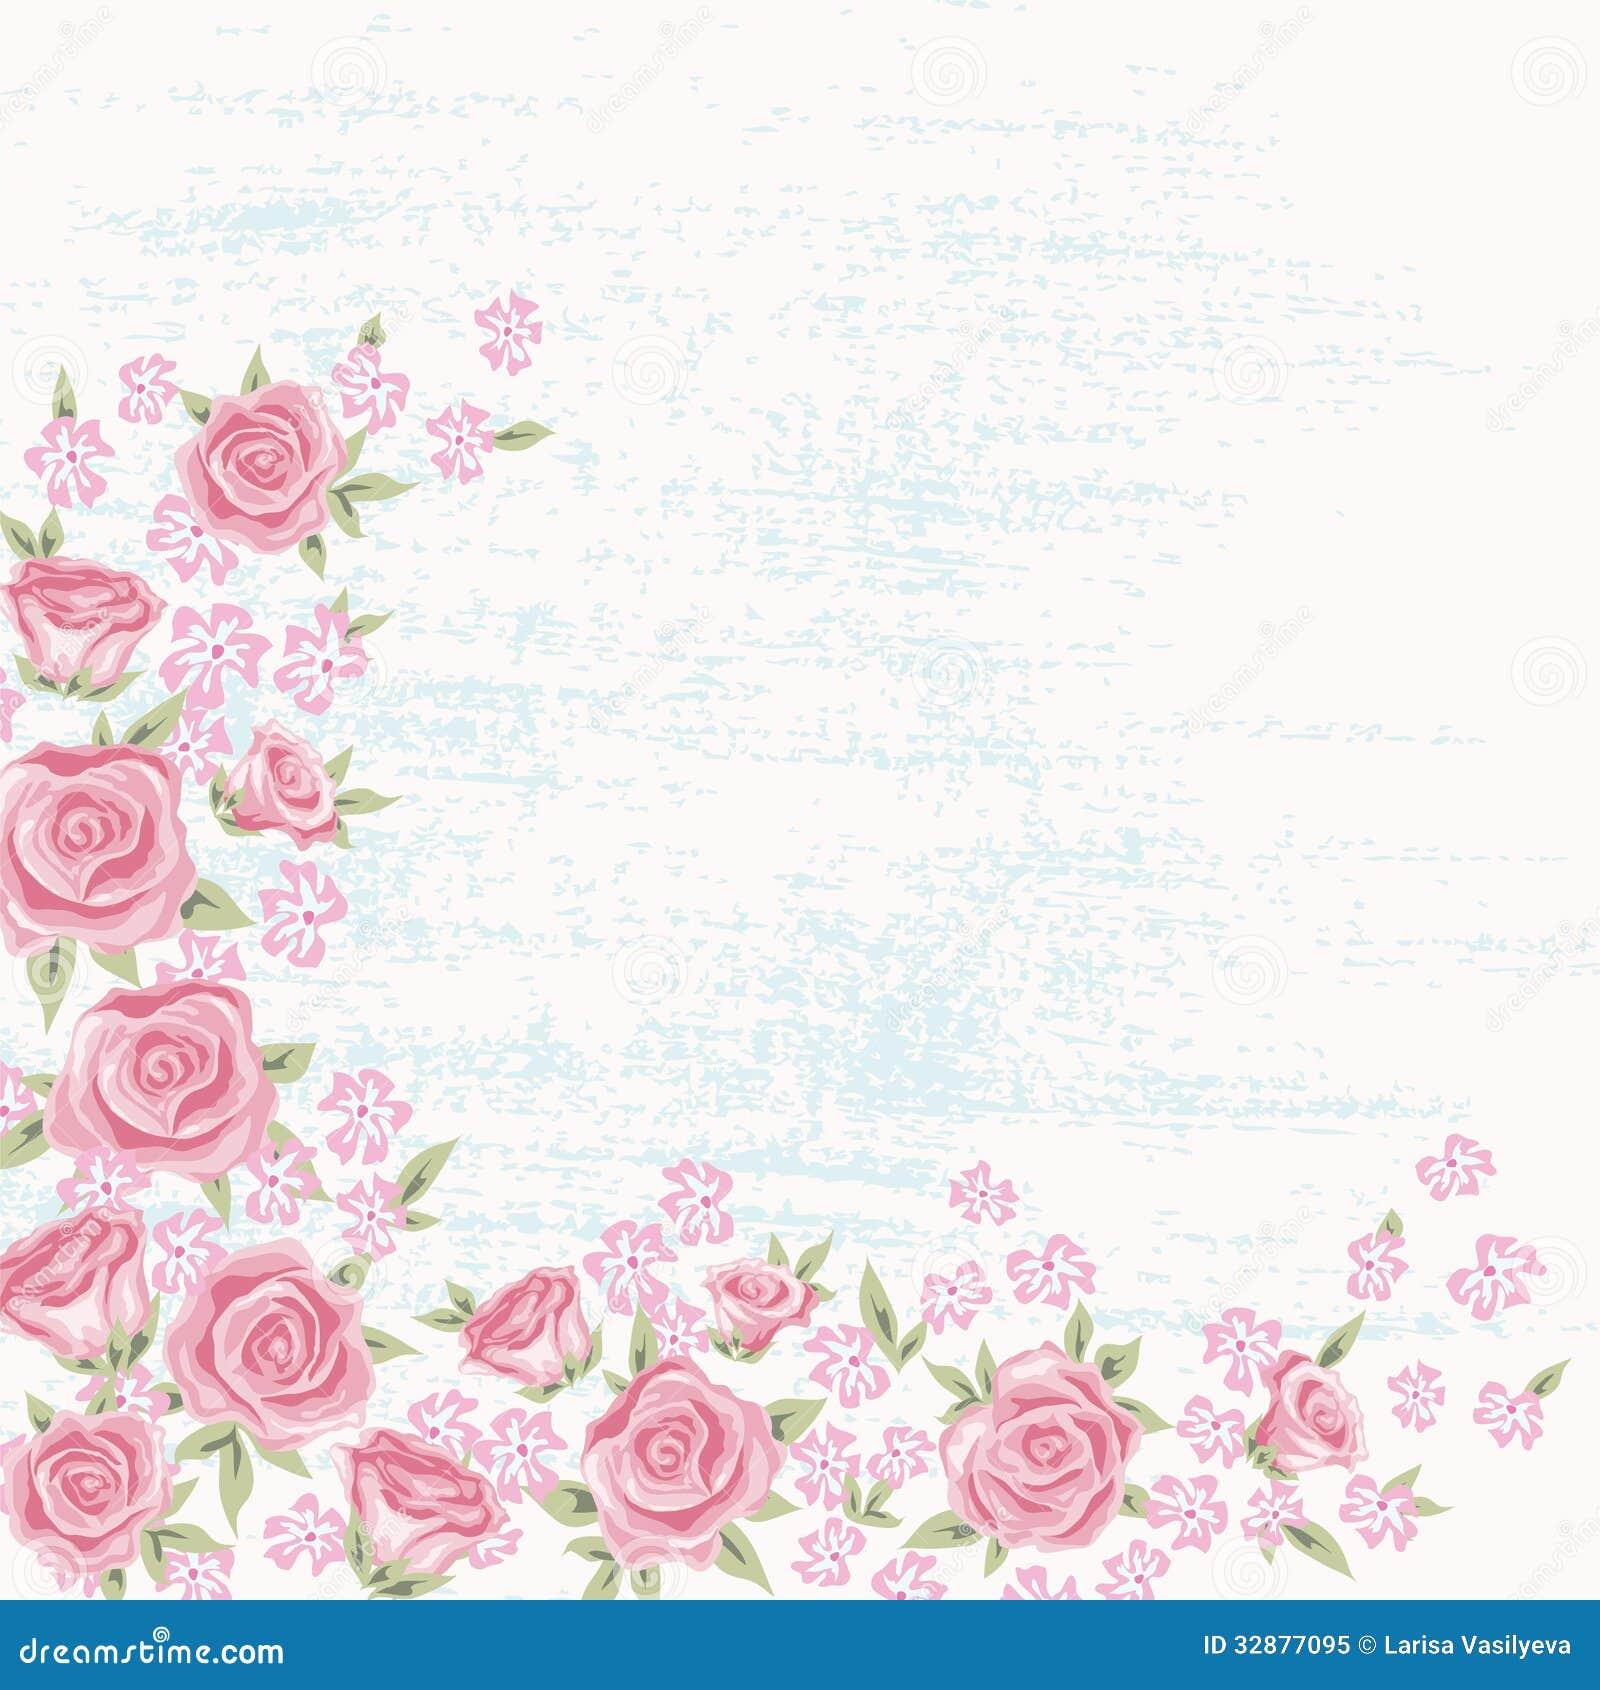 Rose Background 5 Stock Vector. Illustration Of Frame